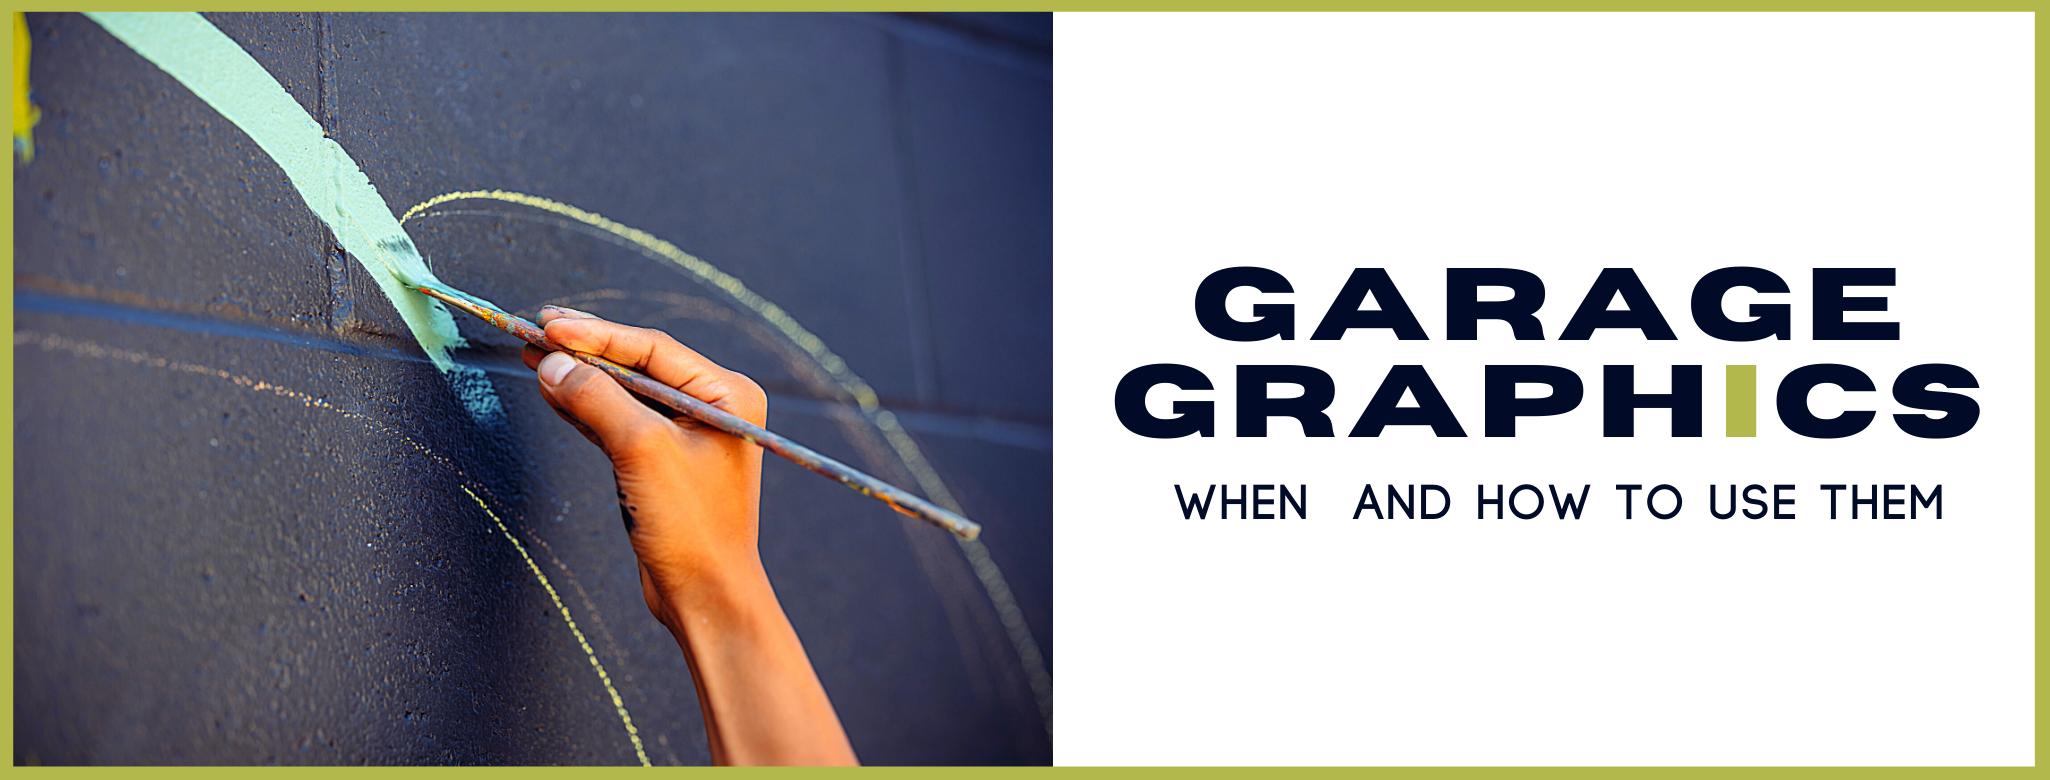 Garage graphics banner